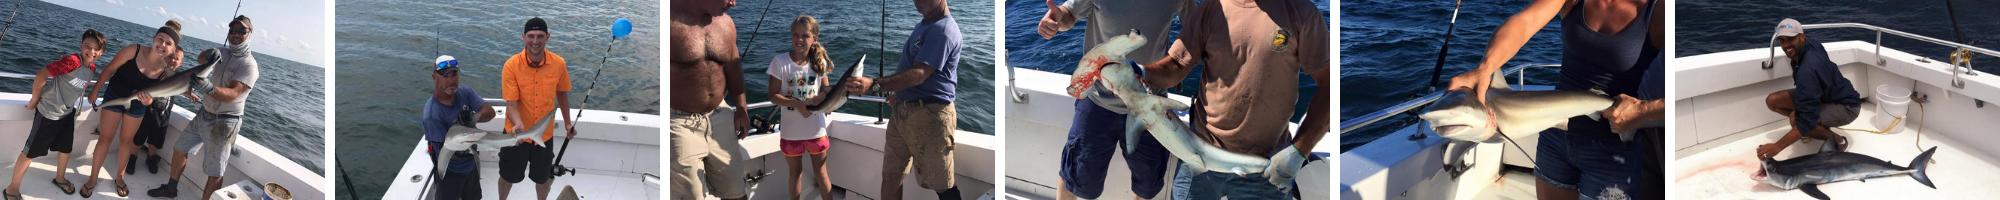 Ocean City Maryland Shark Fishing